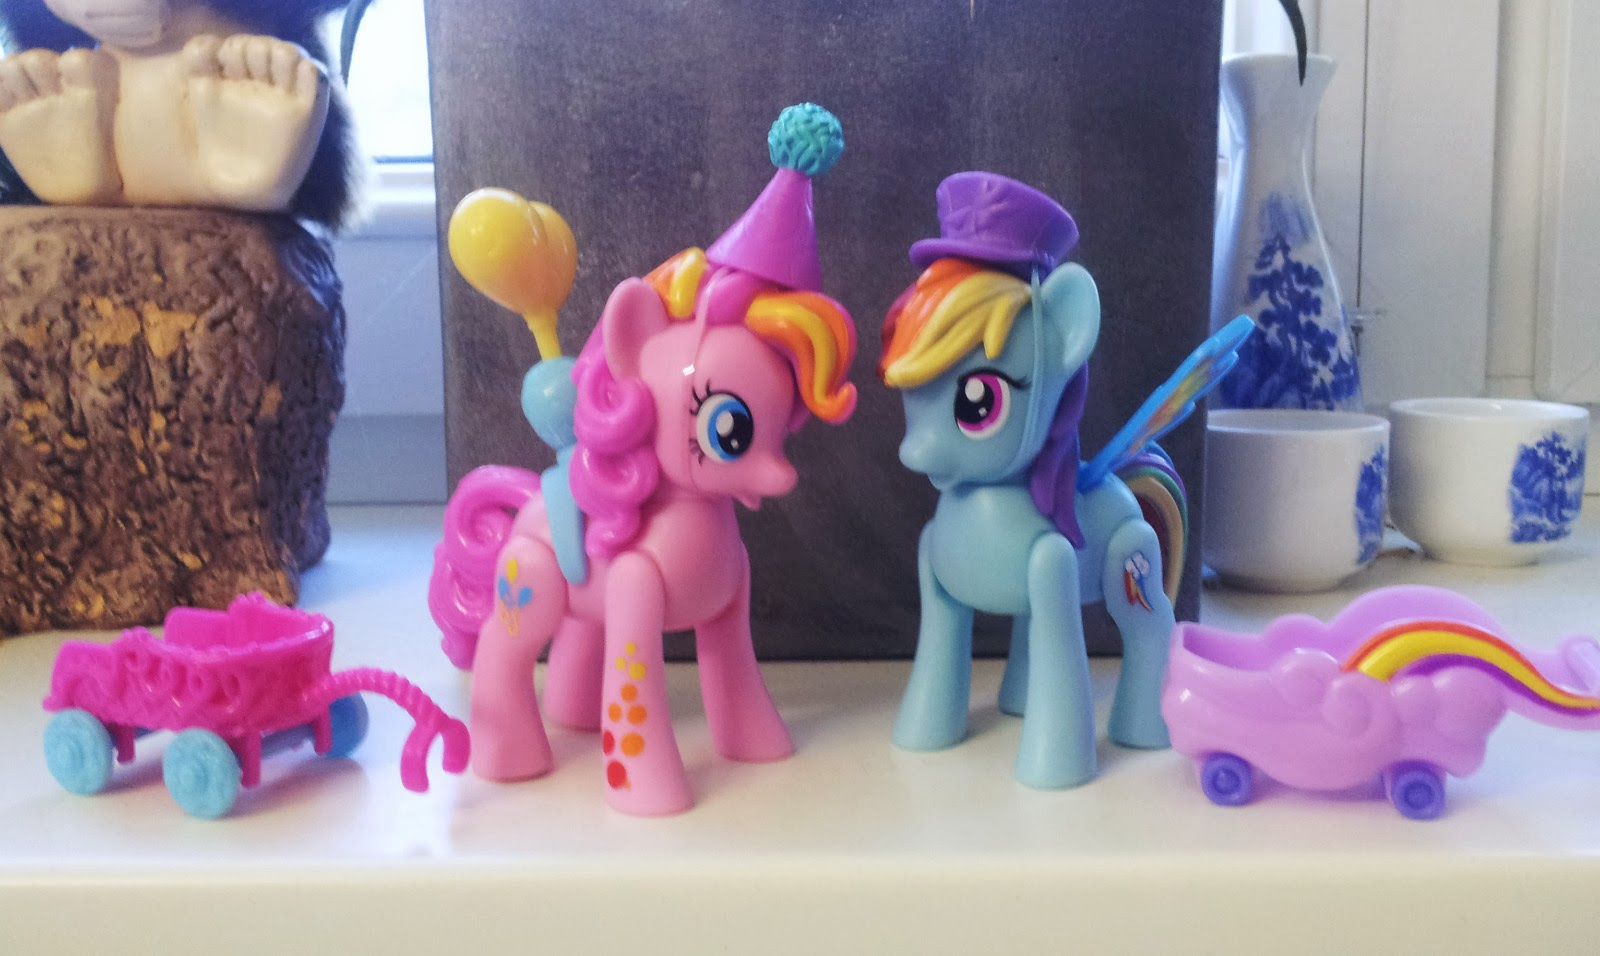 Pinkie Pie and Rainbow Dash Zoom n GO figures